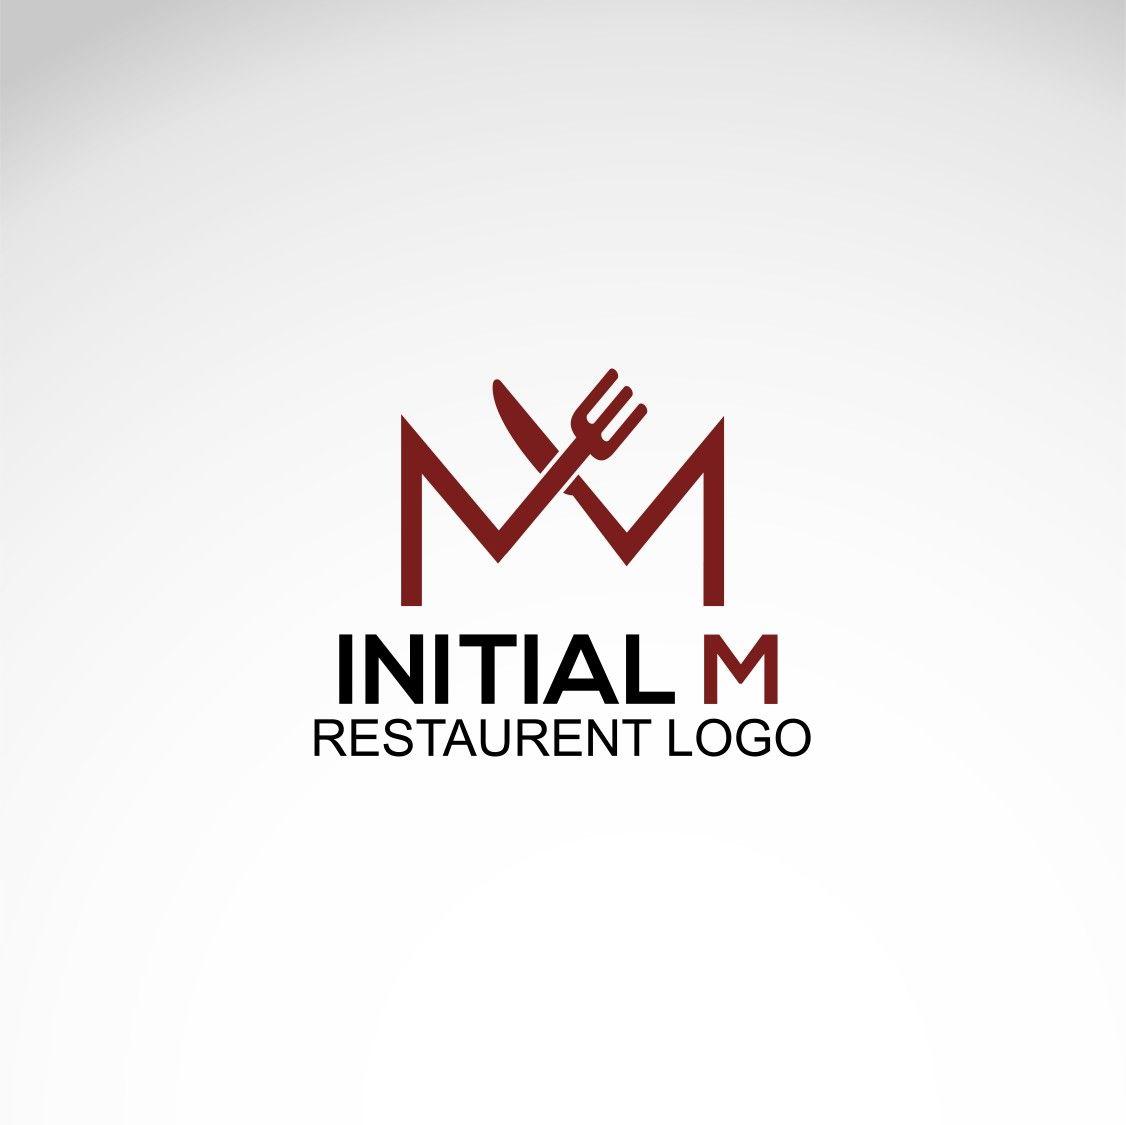 Mursalinshagoto I Will Design Professional Bbq Restaurant And Caffe Logo For 25 On Fiverr Com Logo Food Logo Restaurant Unique Logo Design